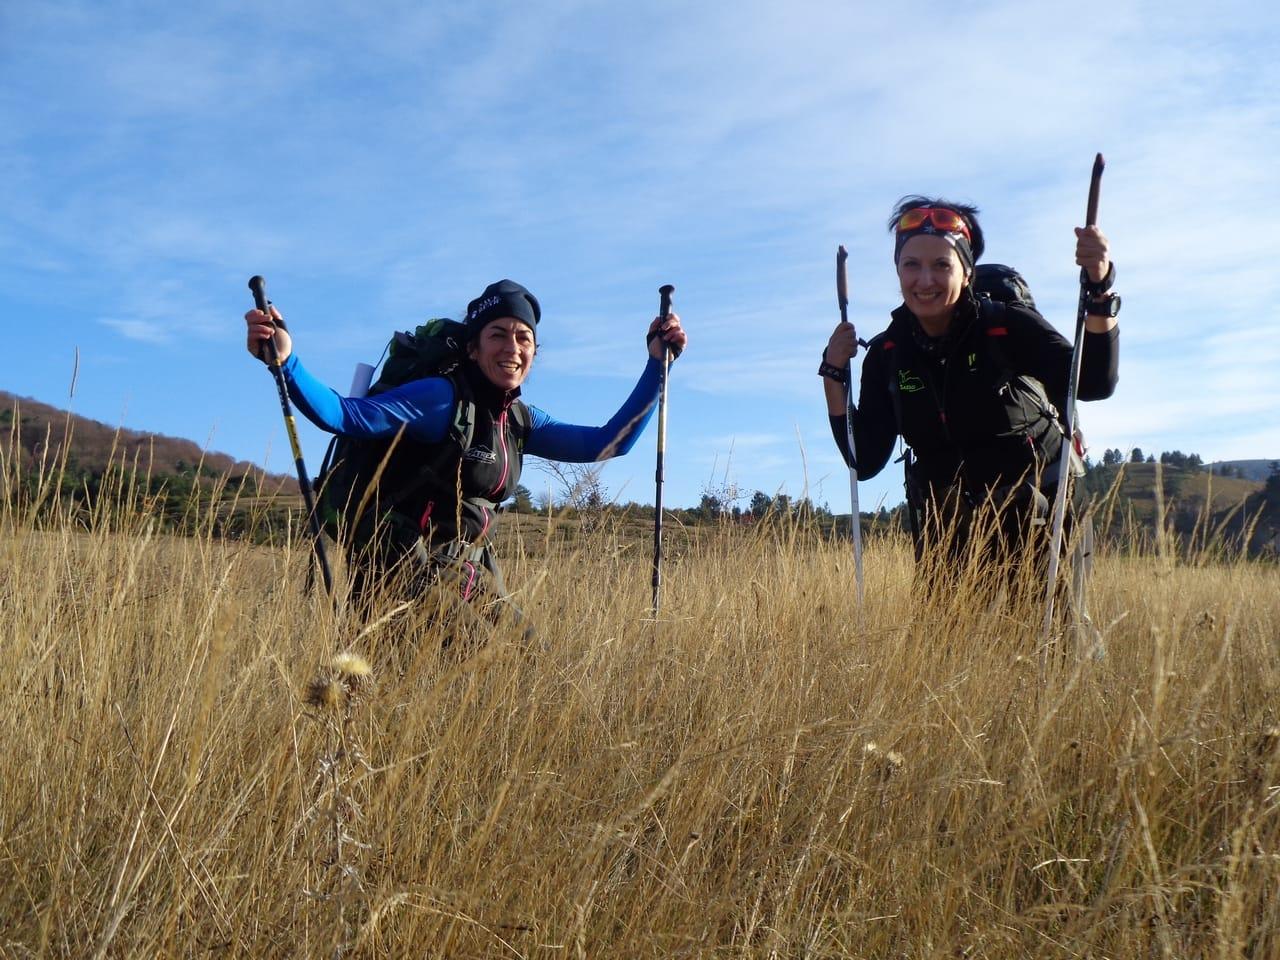 Kalipe mountain love escursionismo e trekking